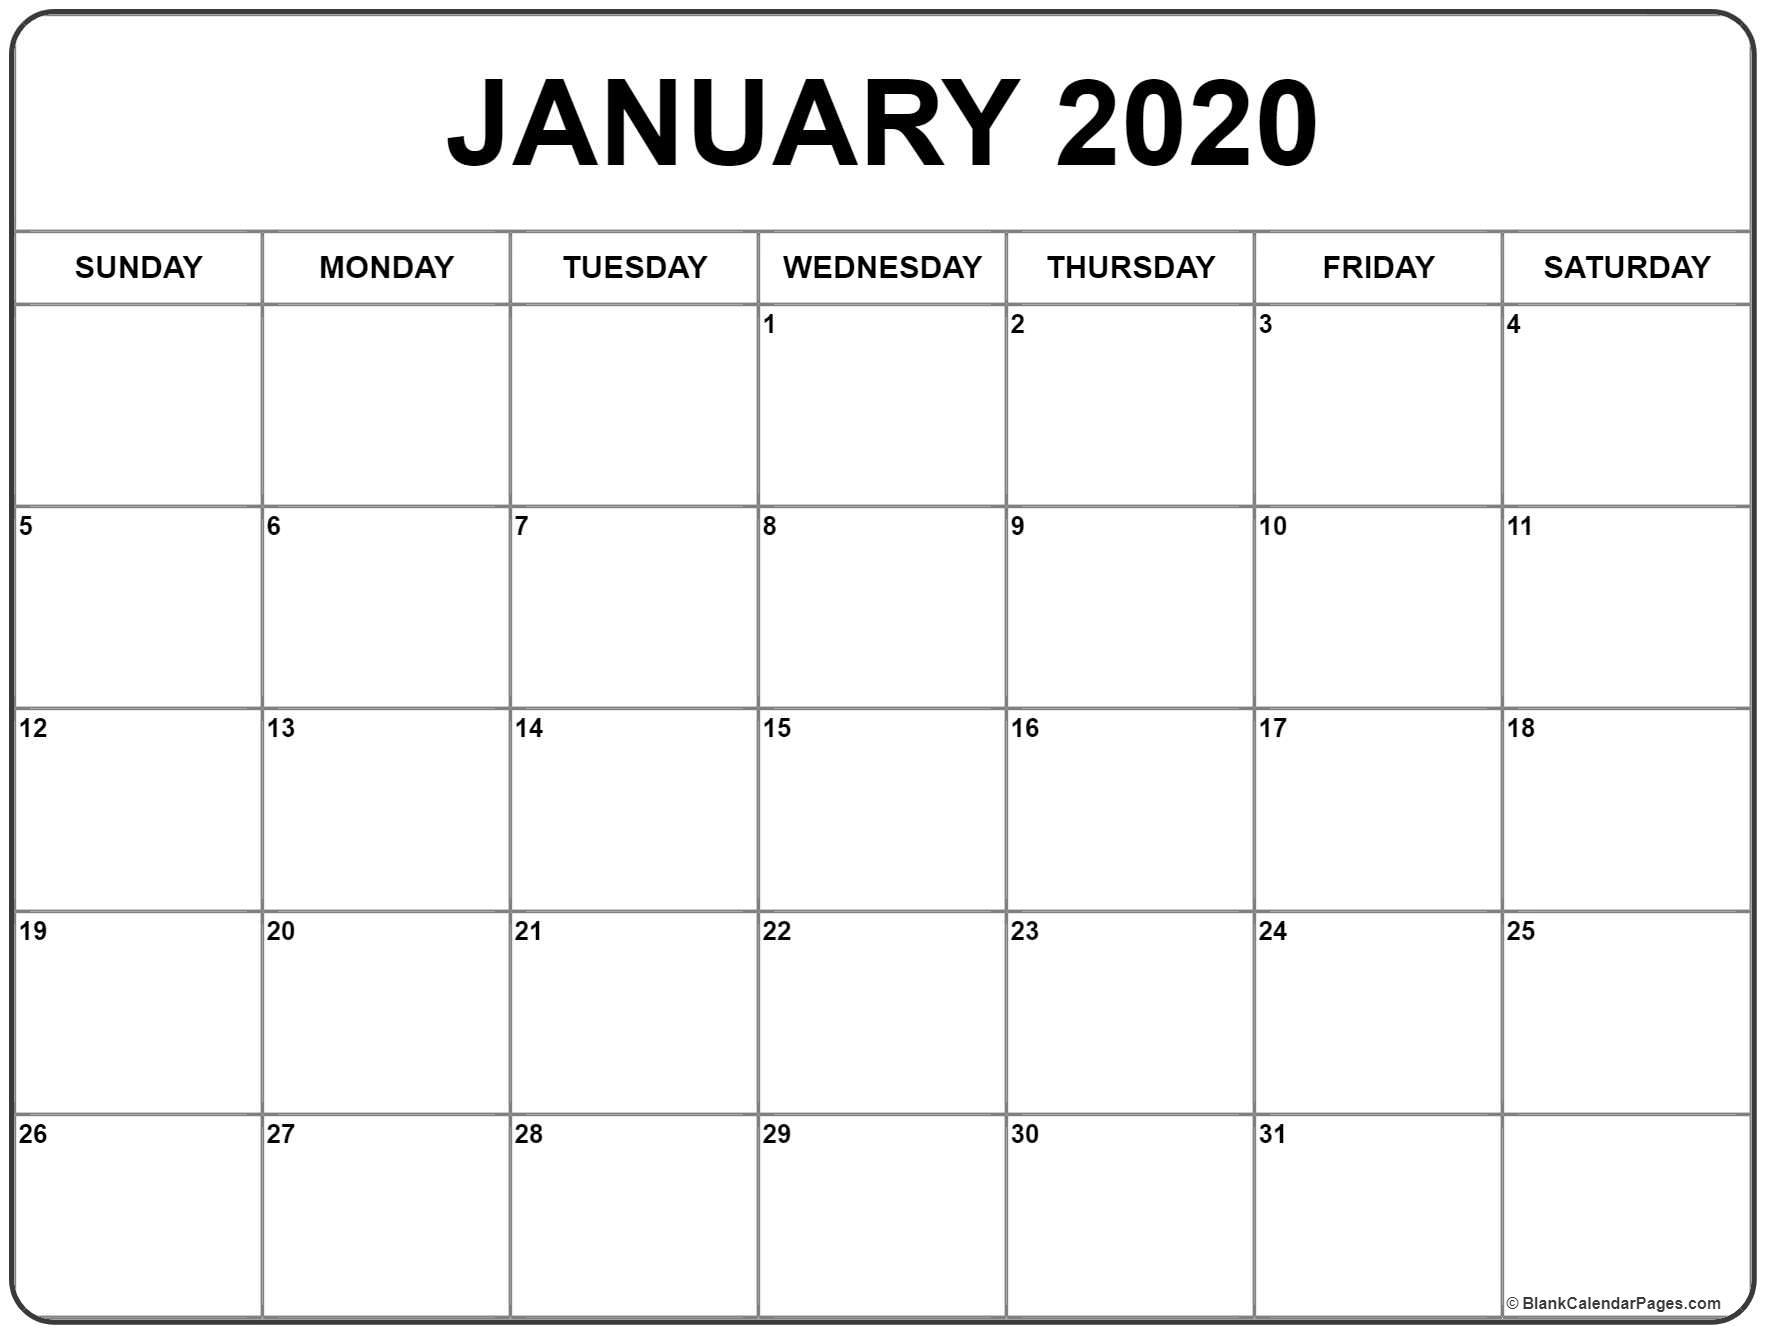 Large Box Printable Calendar 2020 Google - Calendar in Printable Calendar Large Box 2020